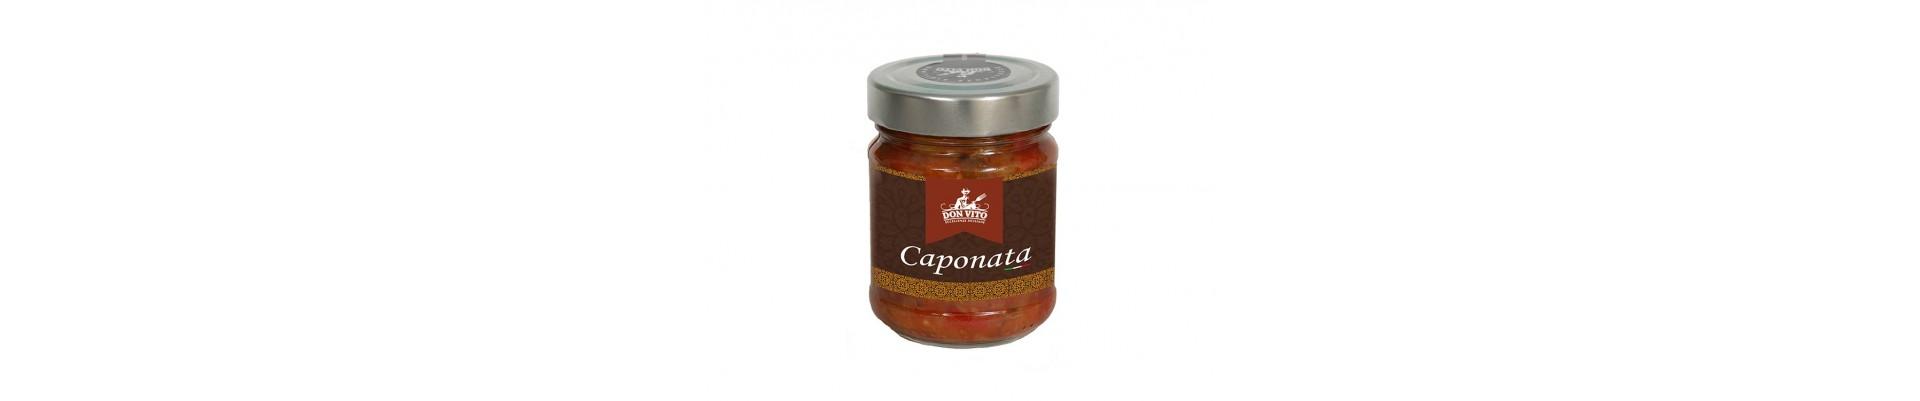 Online sale of eggplant caponate and pistachio pesto from Bronte, haze